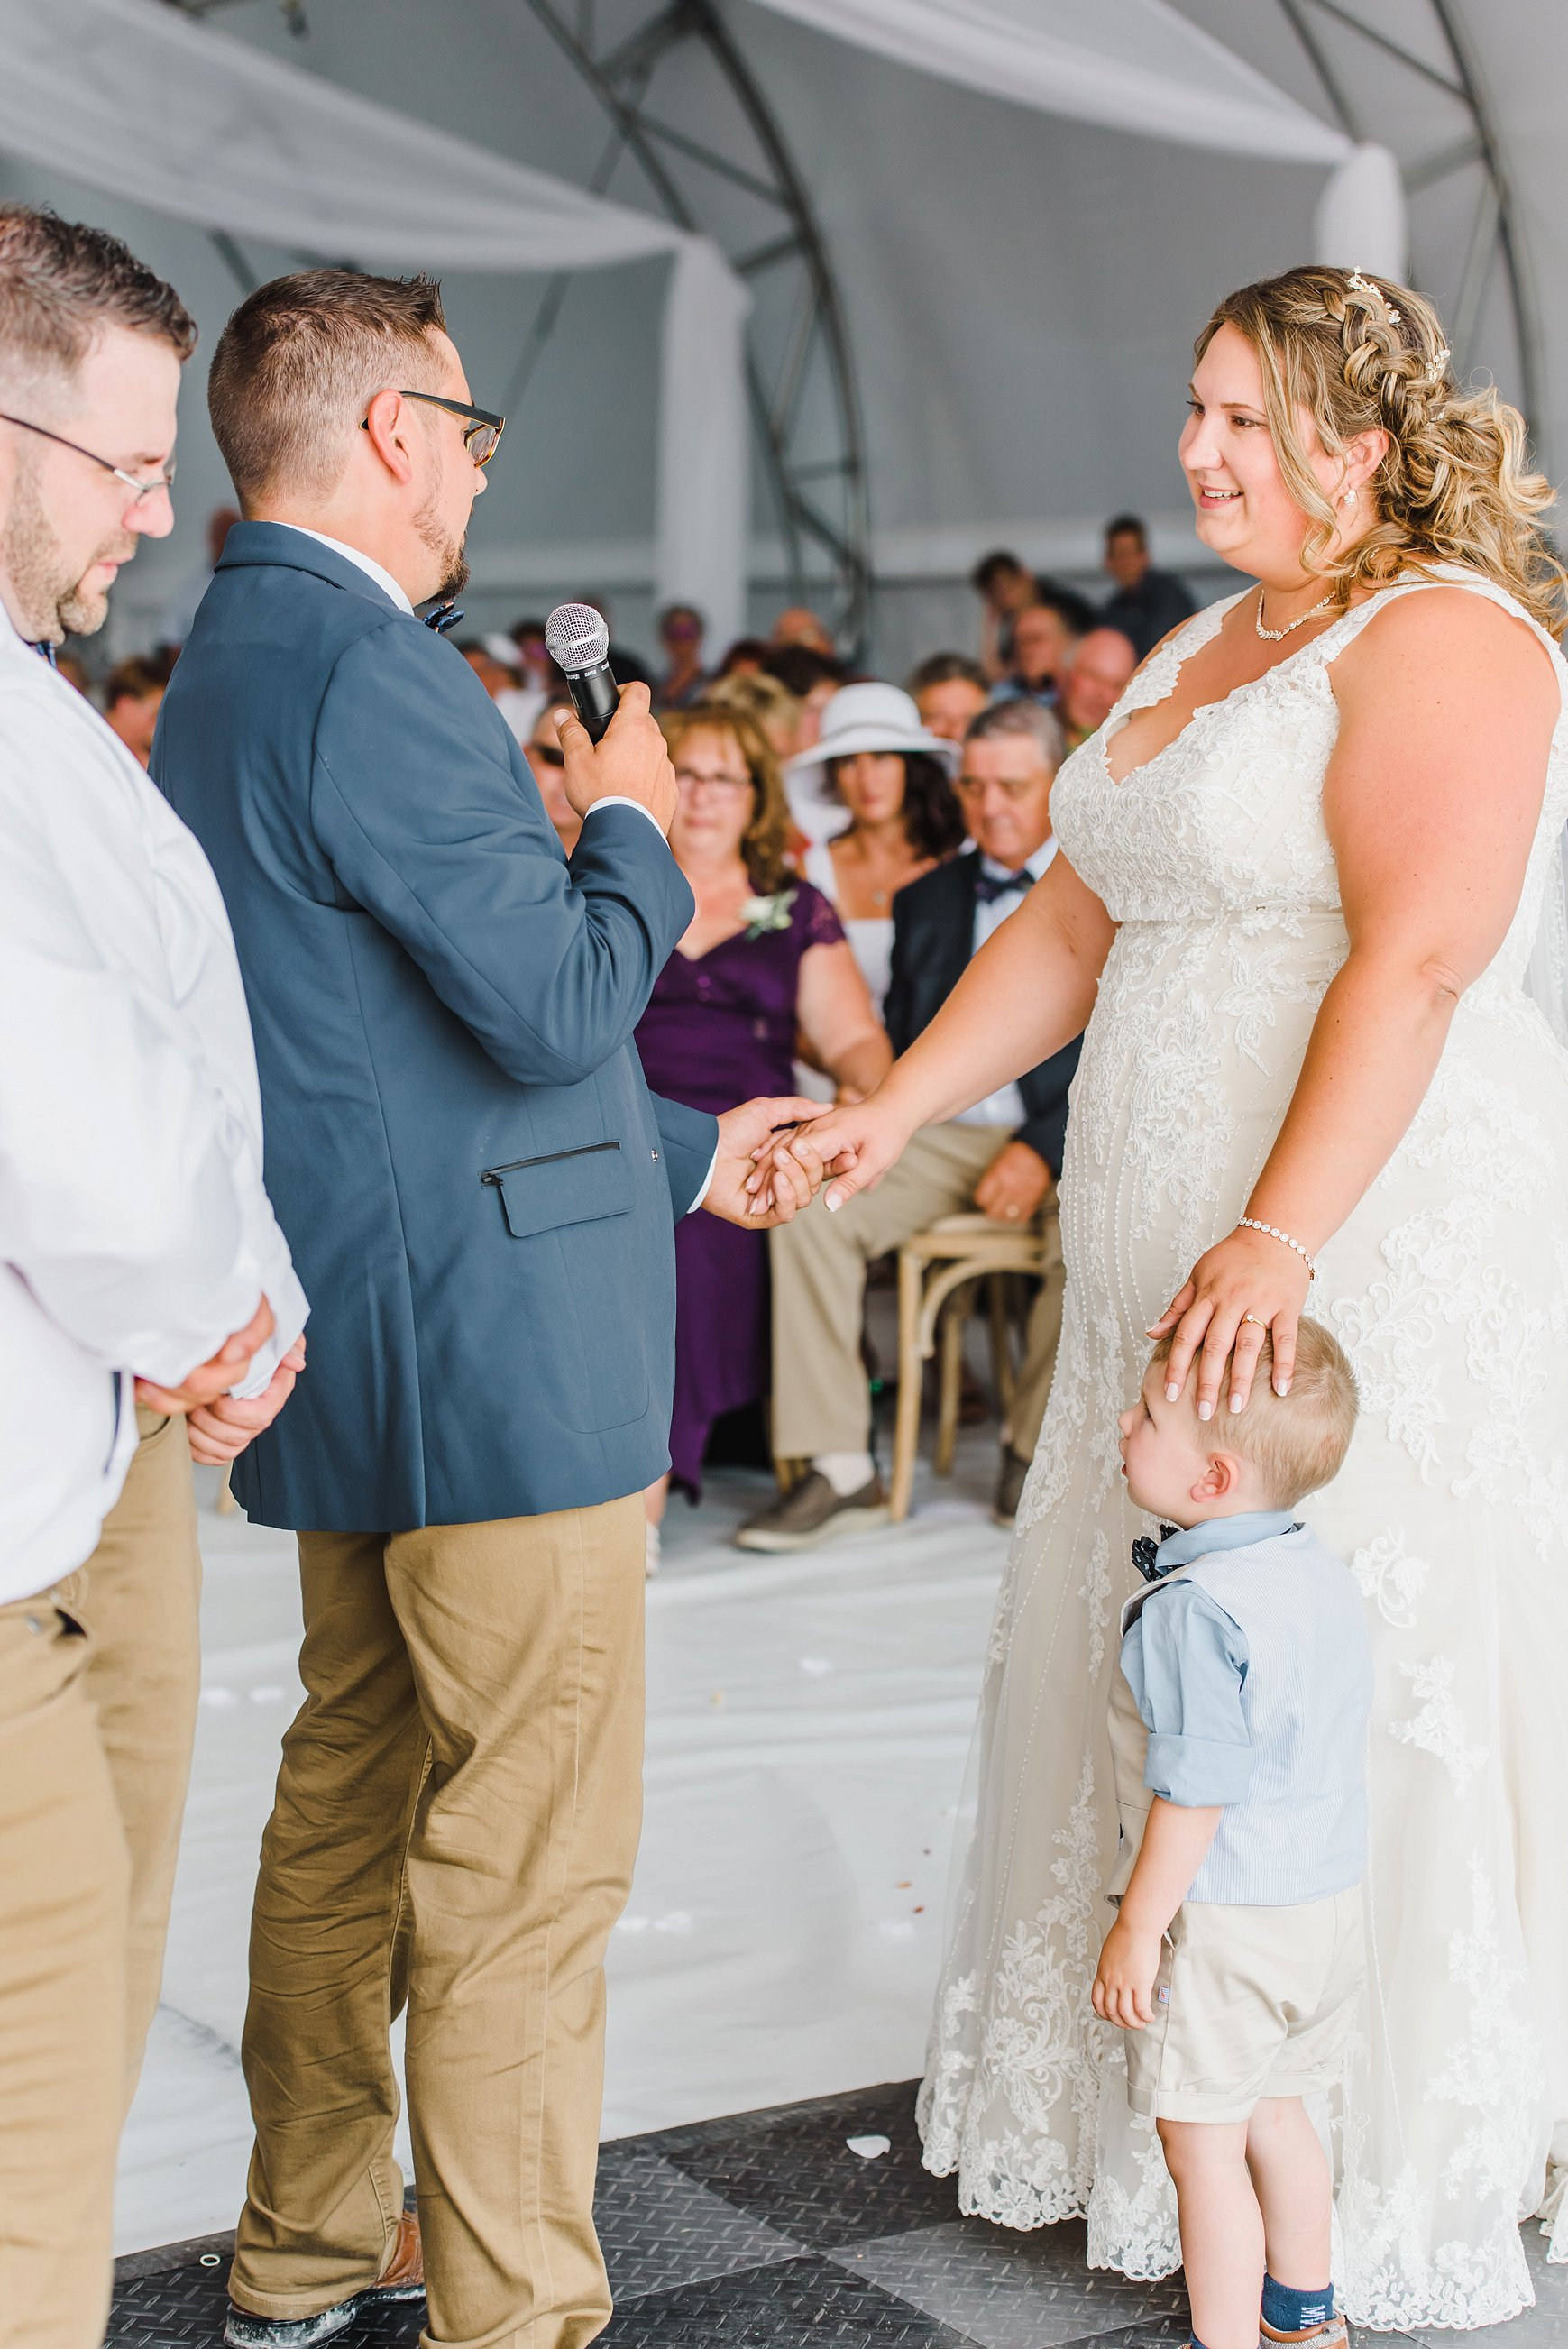 light airy indie fine art ottawa wedding photographer | Ali and Batoul Photography_0367.jpg